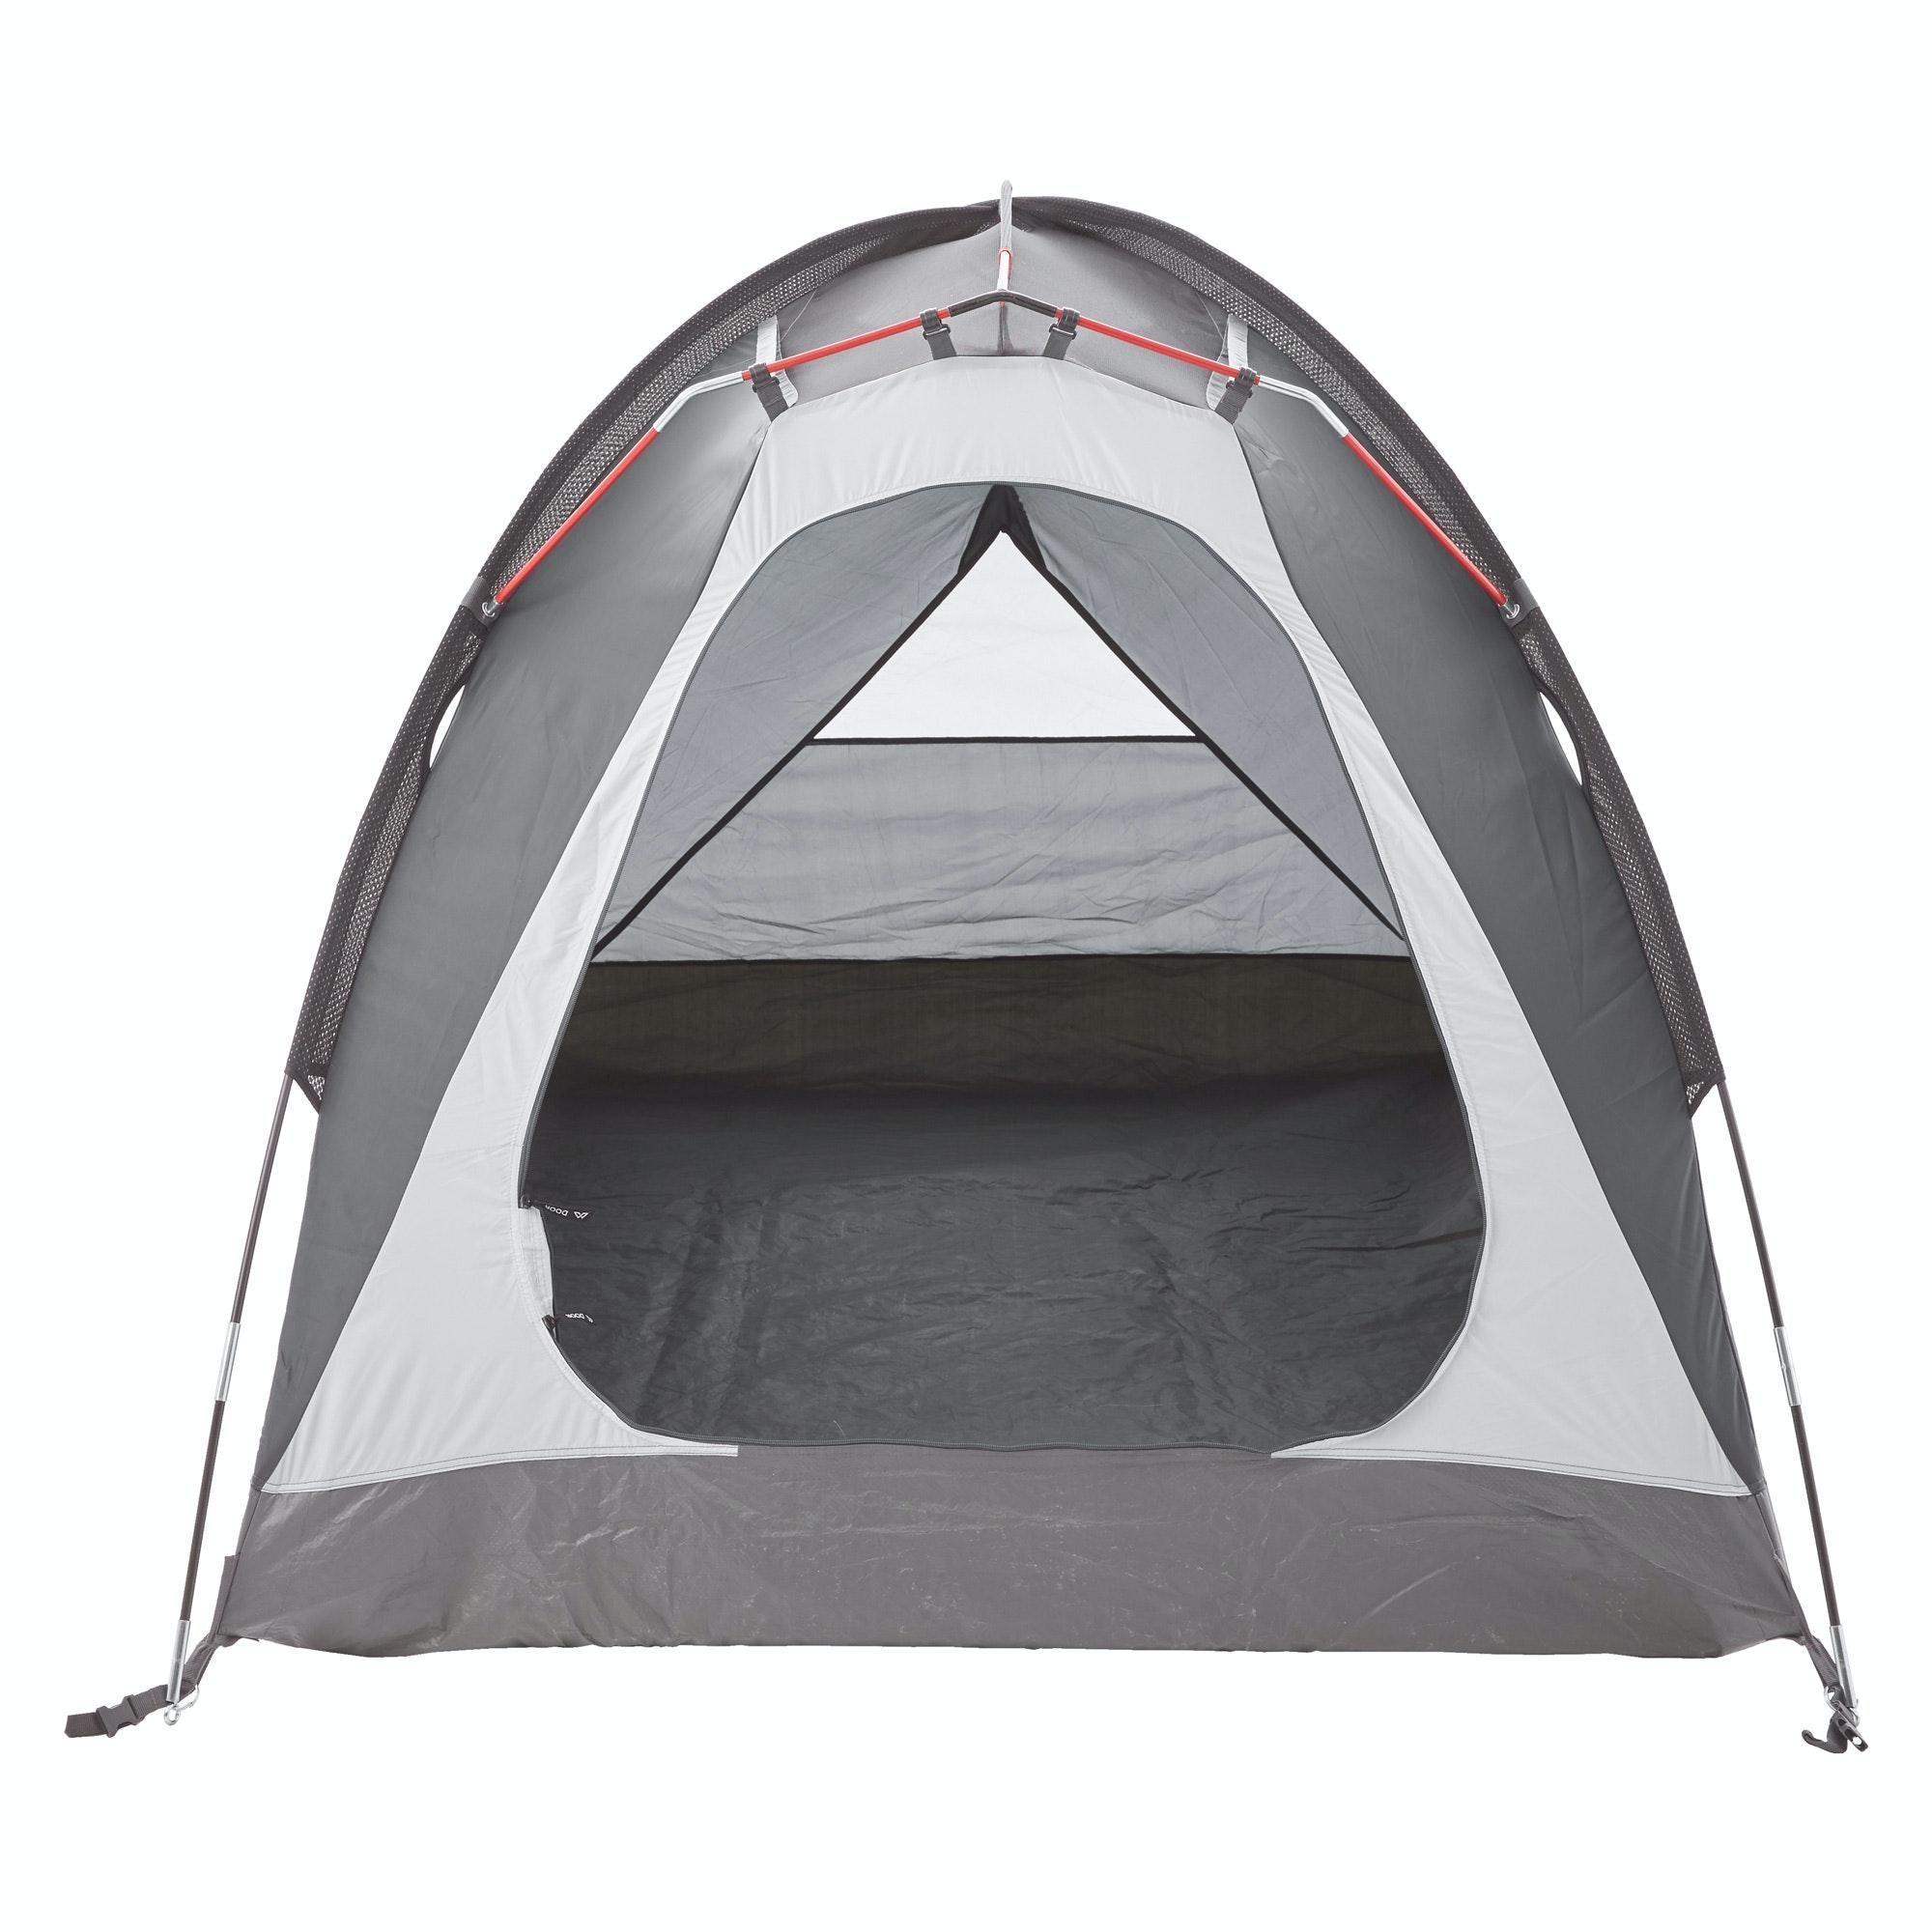 H41  sc 1 st  Kathmandu & Retreat 40 2 Person Tent - Warm Grey/Sunset